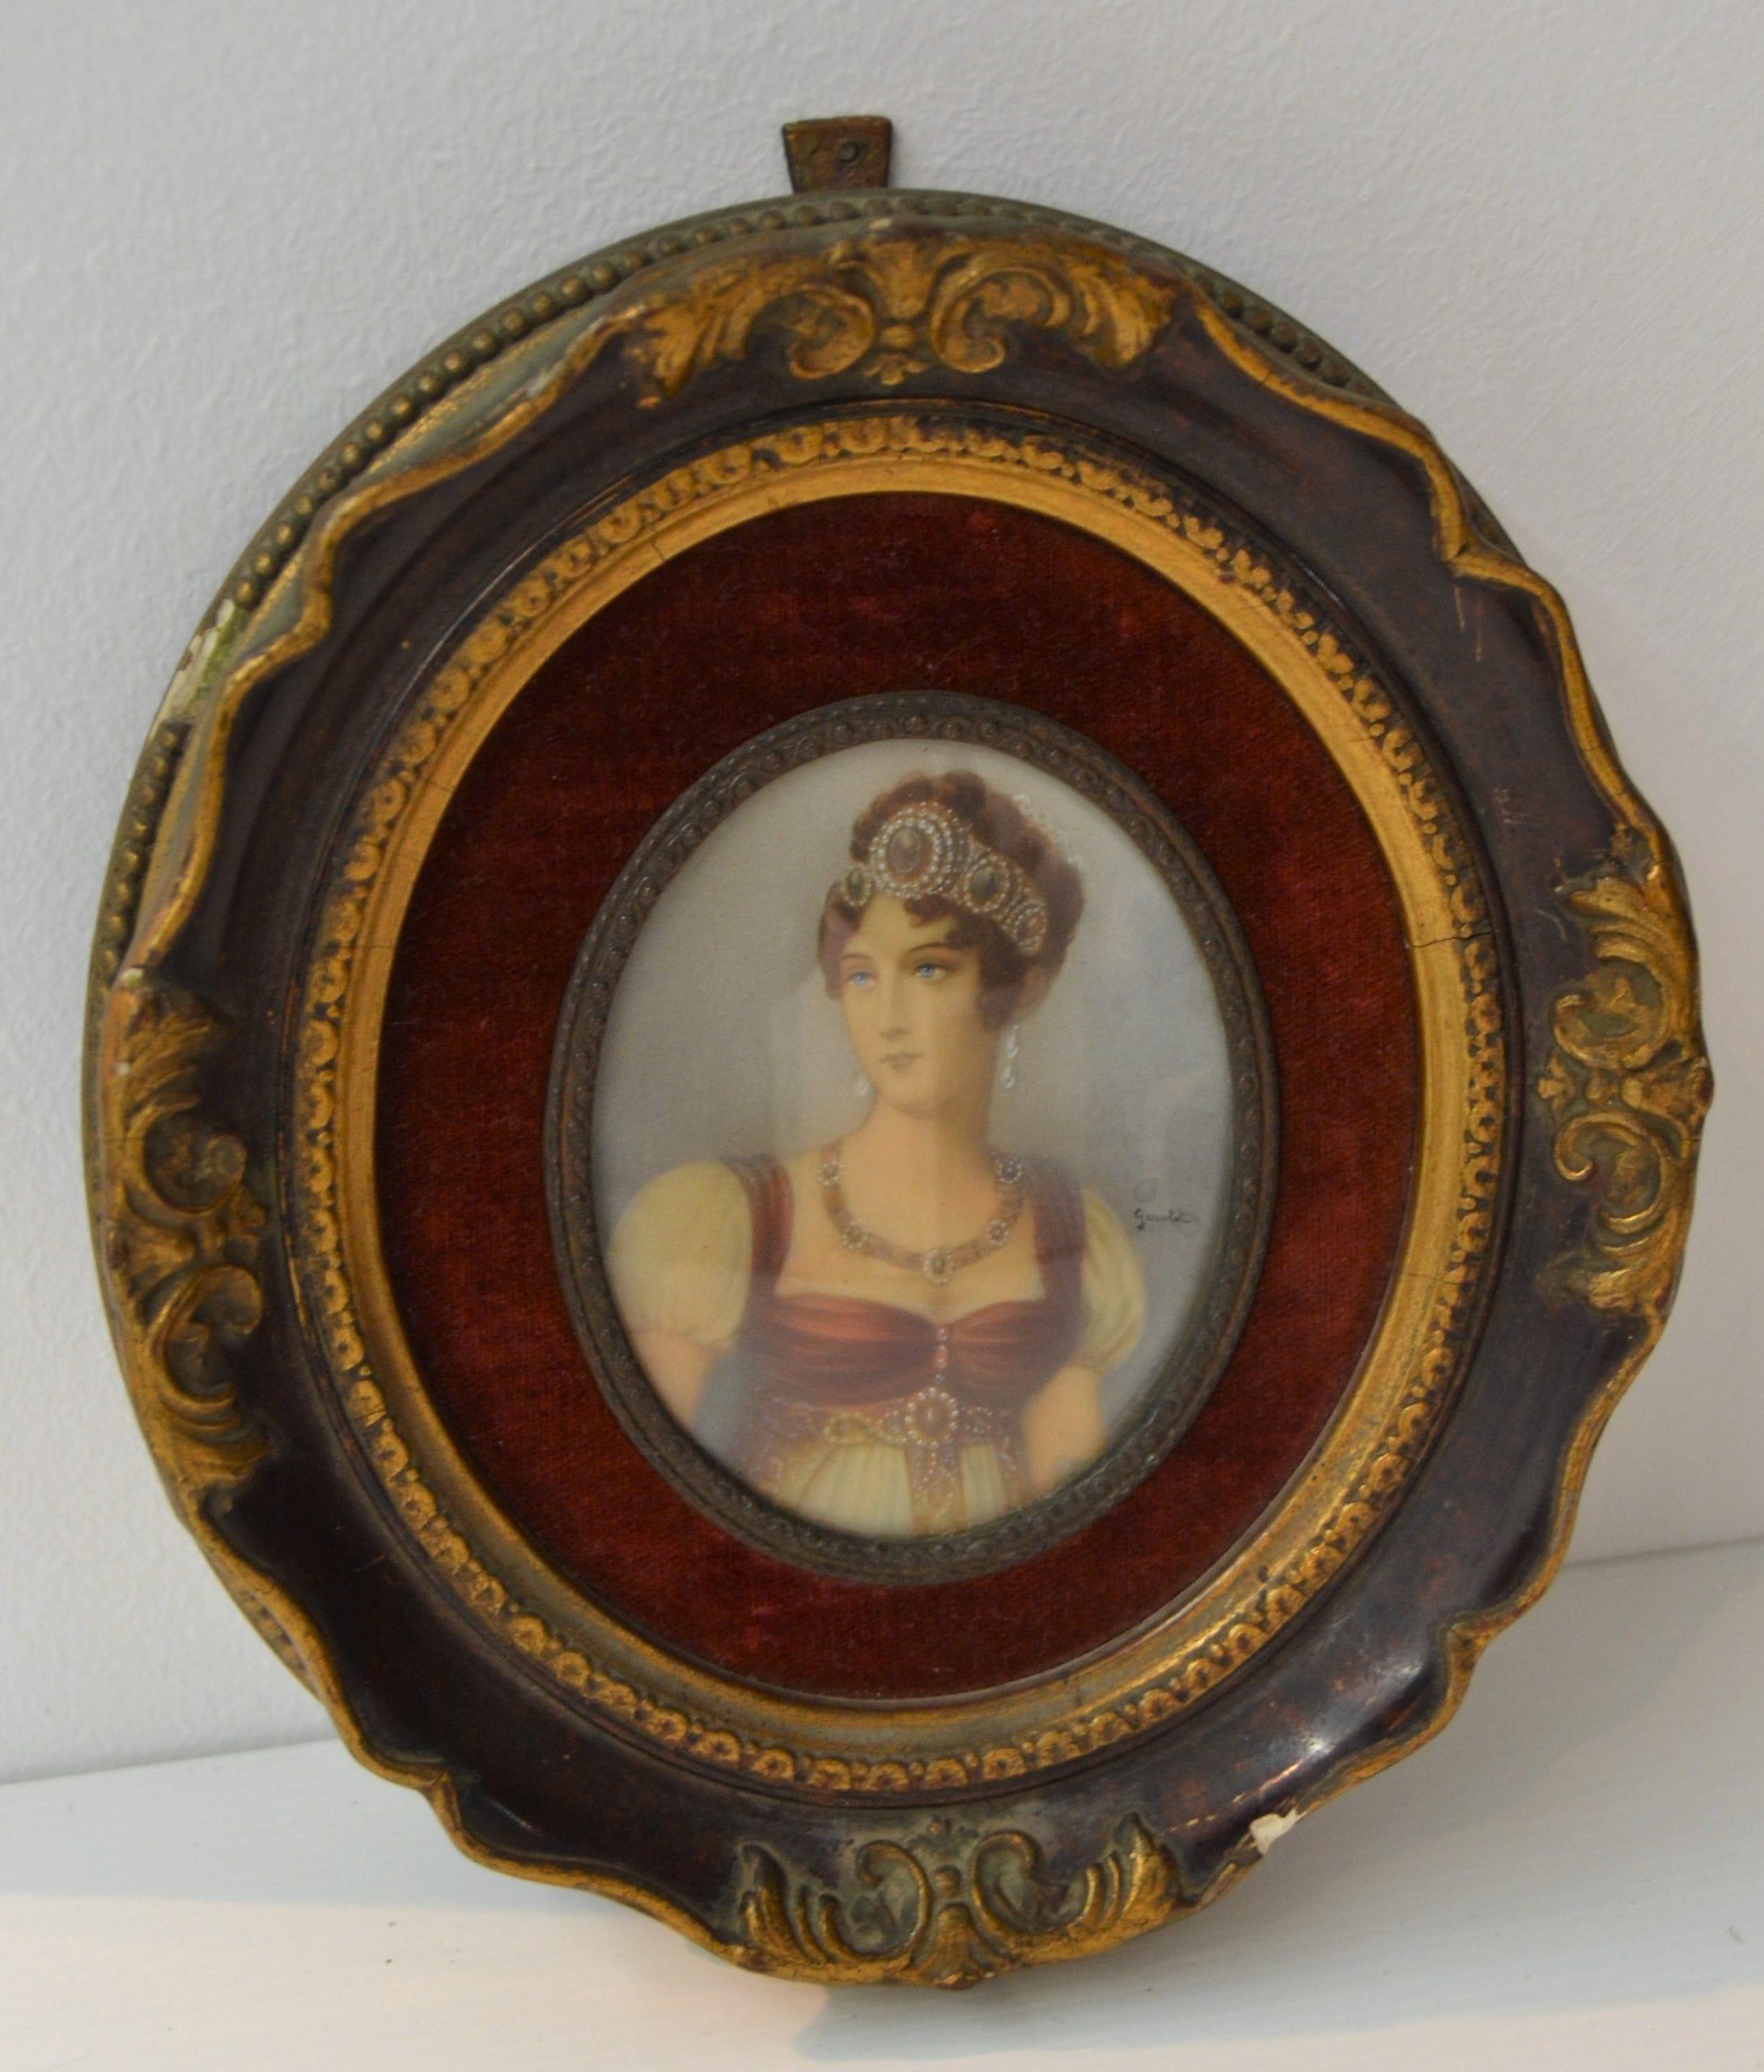 Gerold: Ovális női portré miniatúra